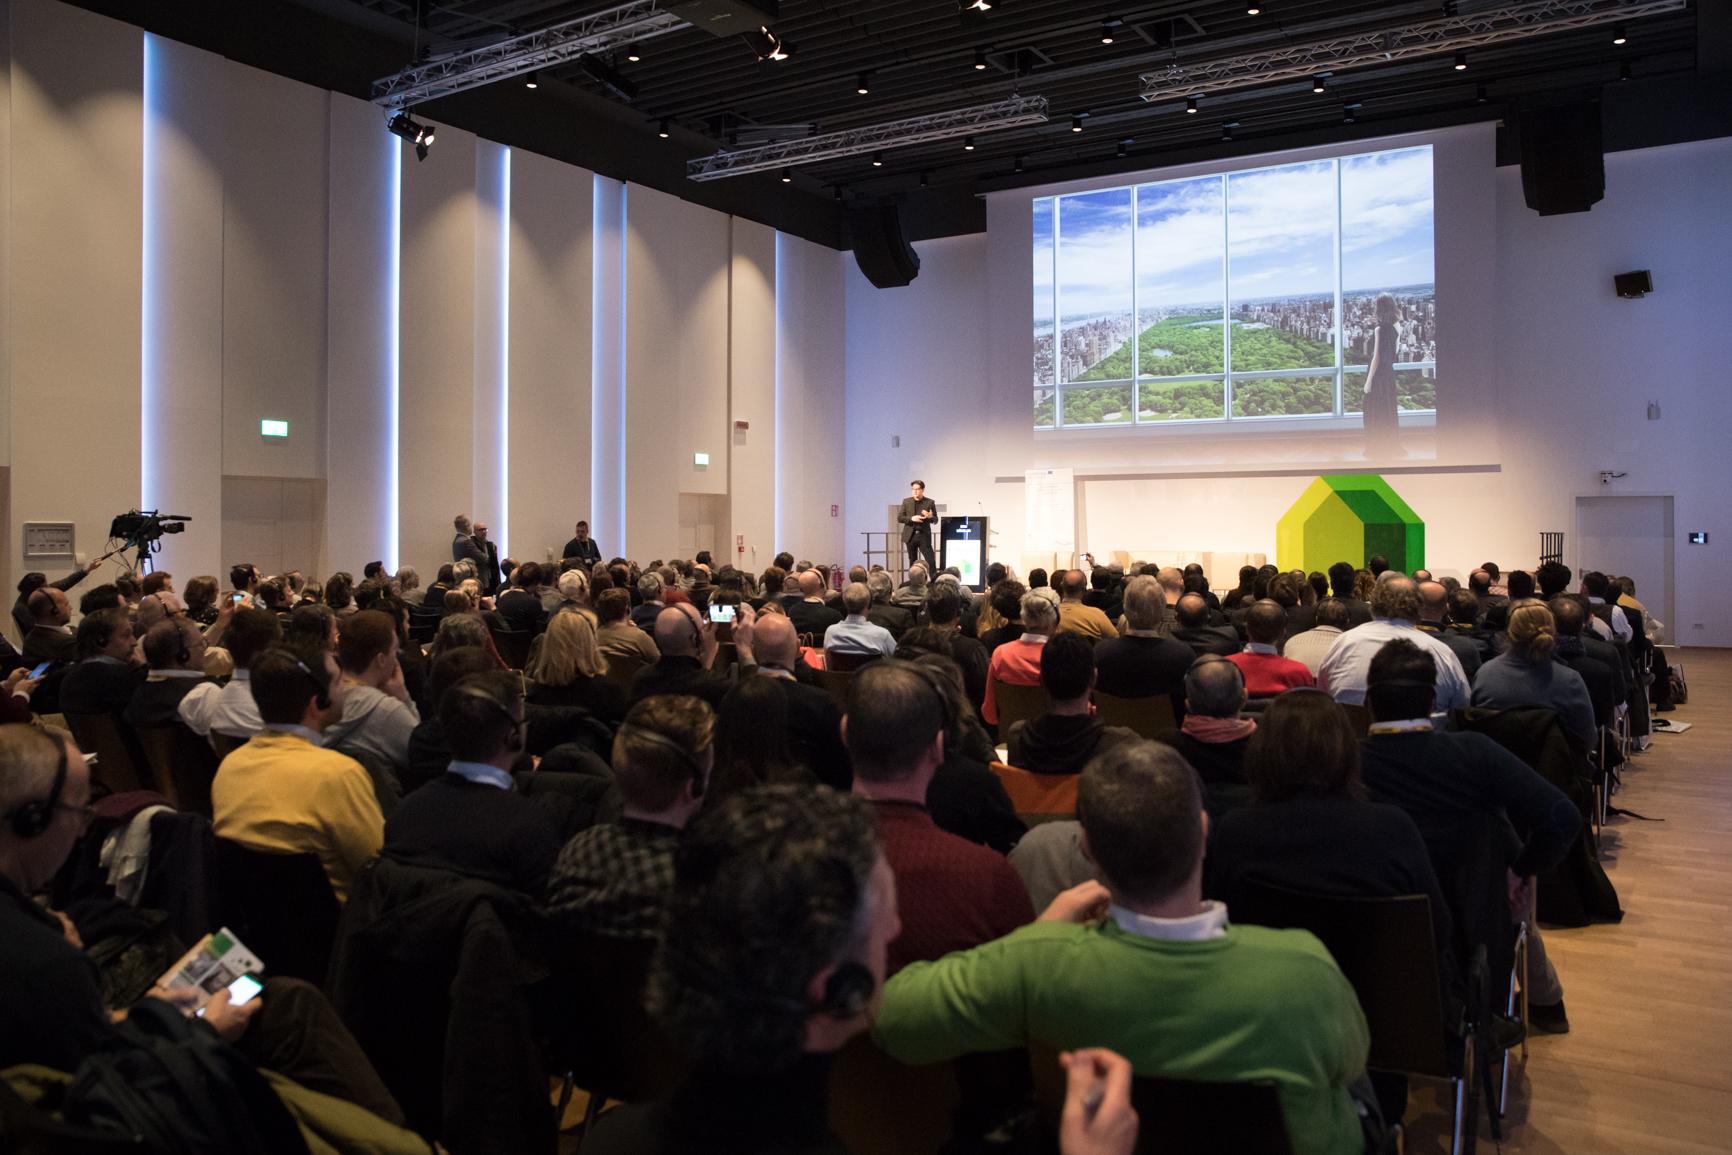 conferenza Klimahouse 2018 Foto di Marco Parisi